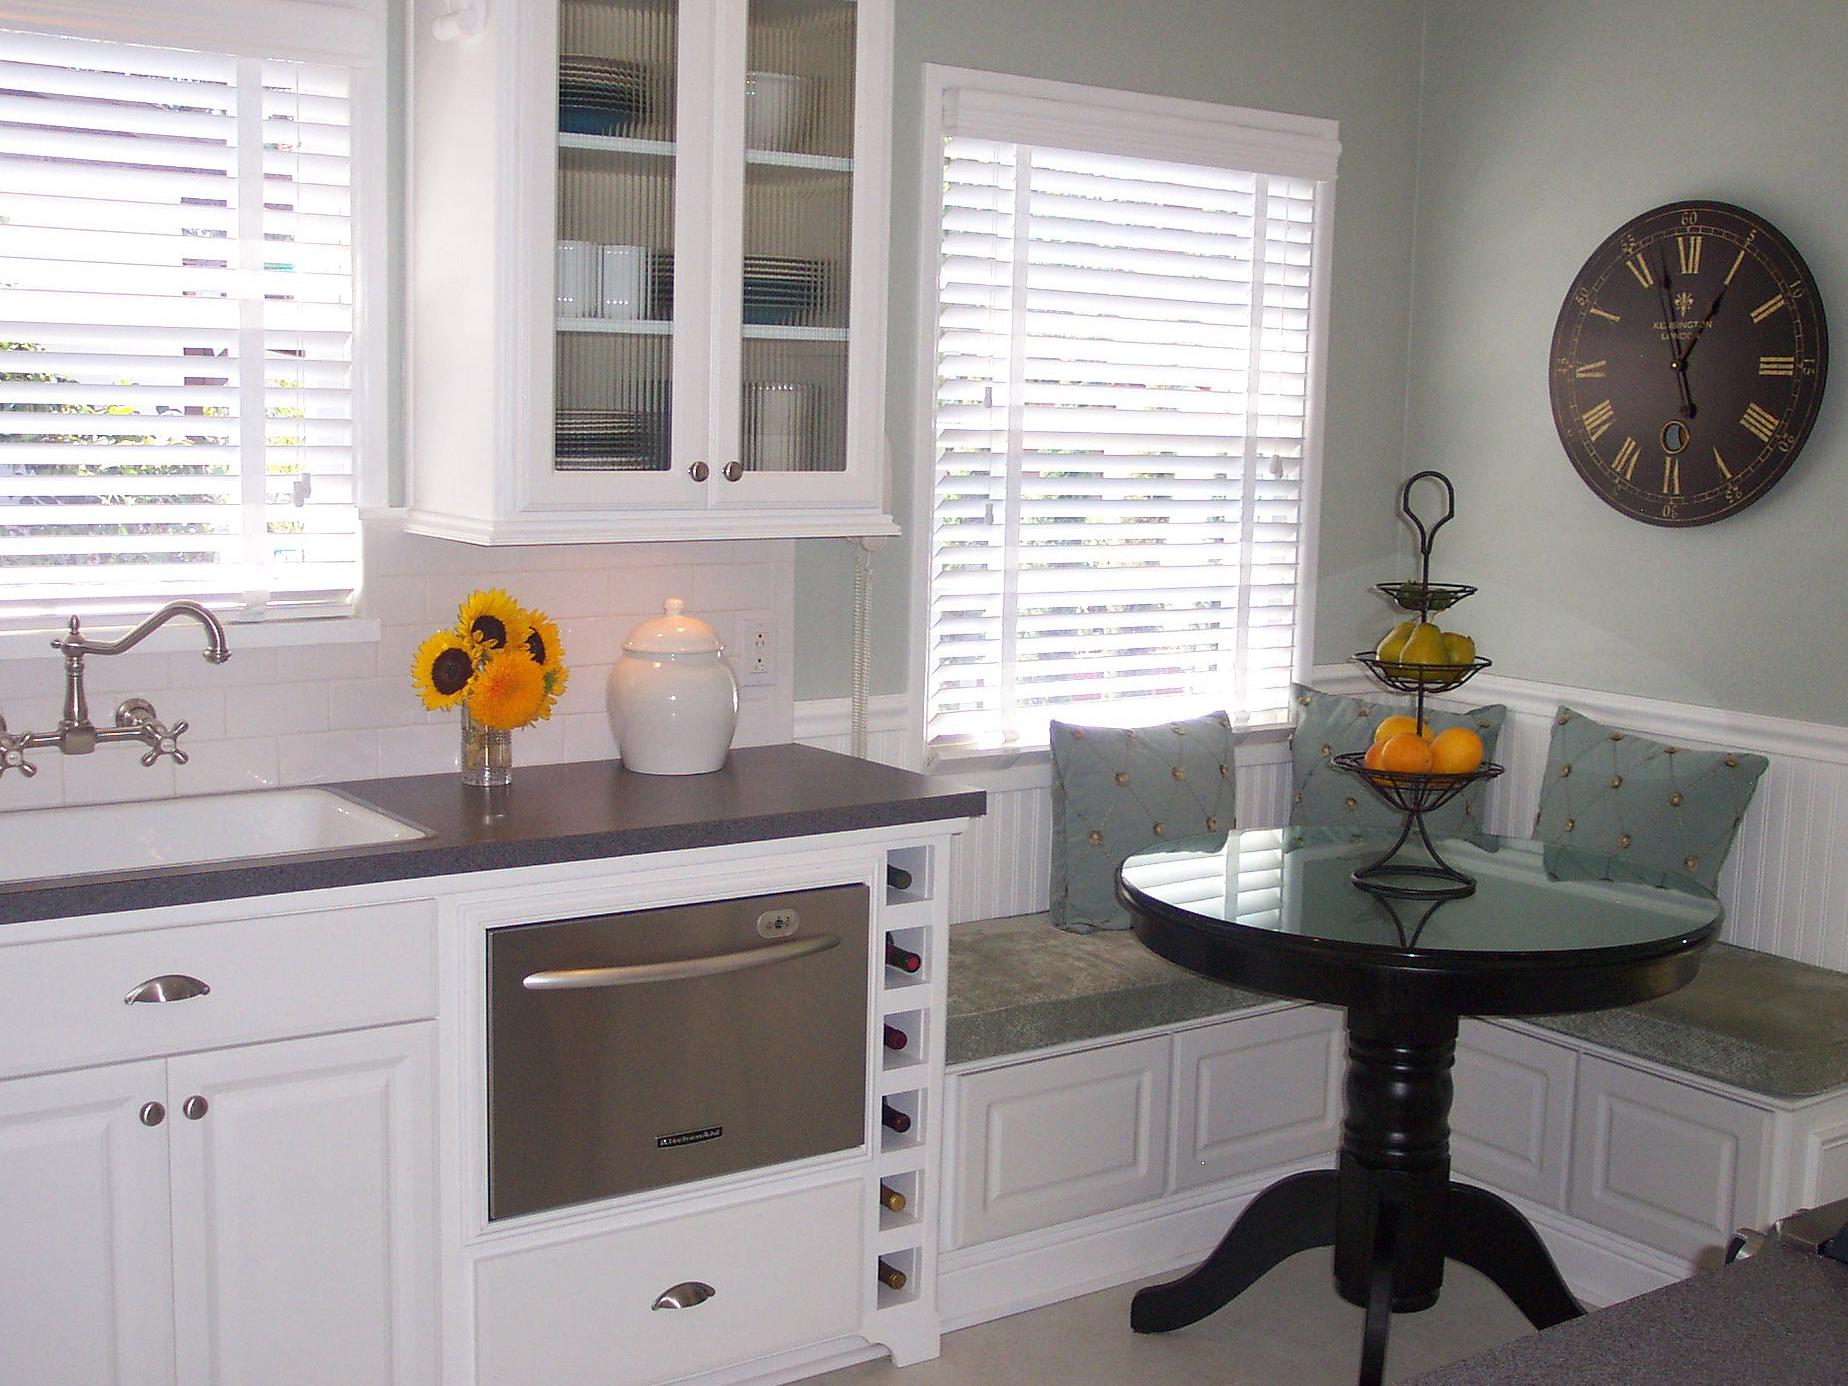 Дизайн кухни с мягким уголком